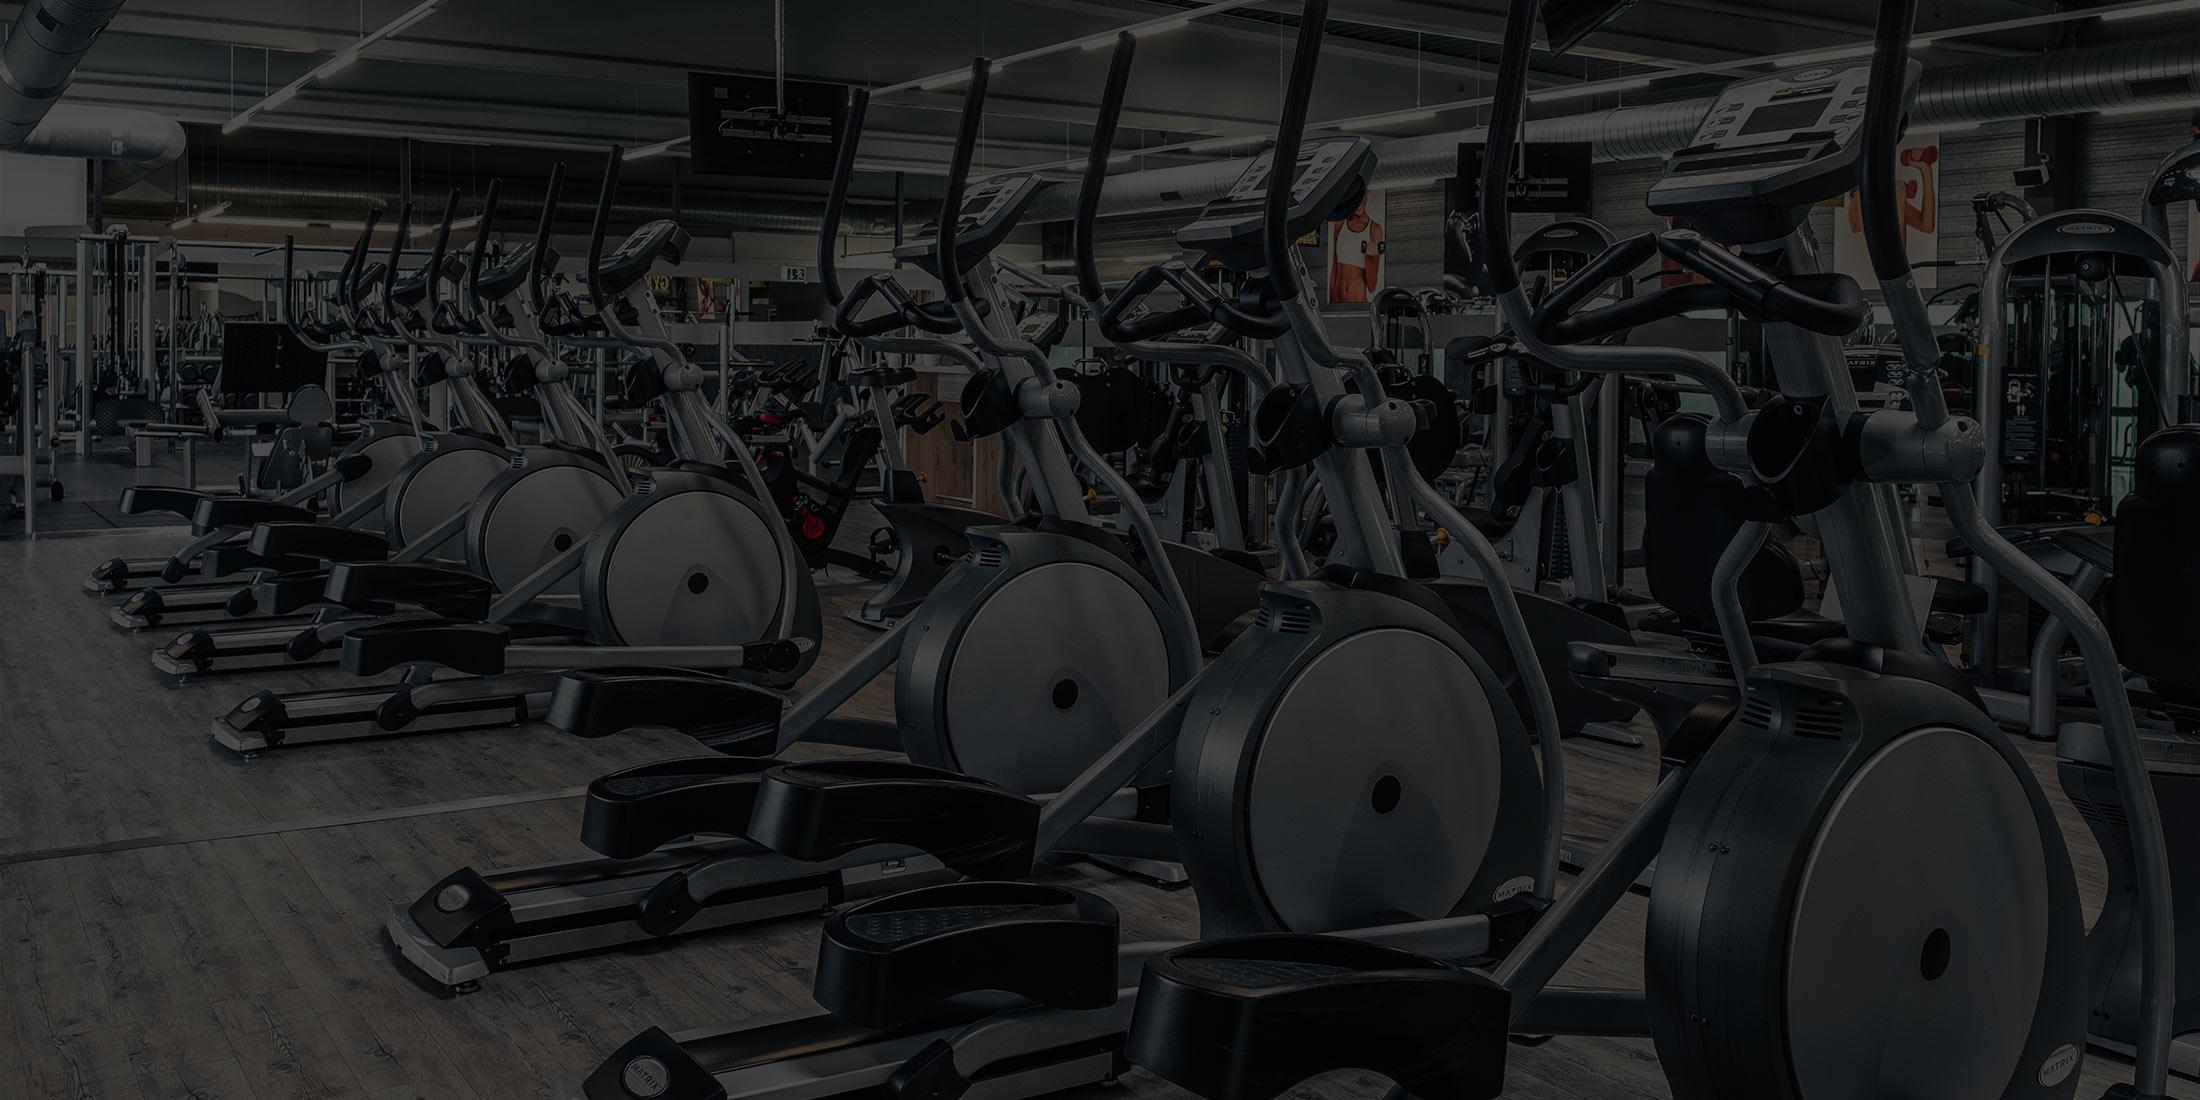 fitnessstudio hilden fitness gym